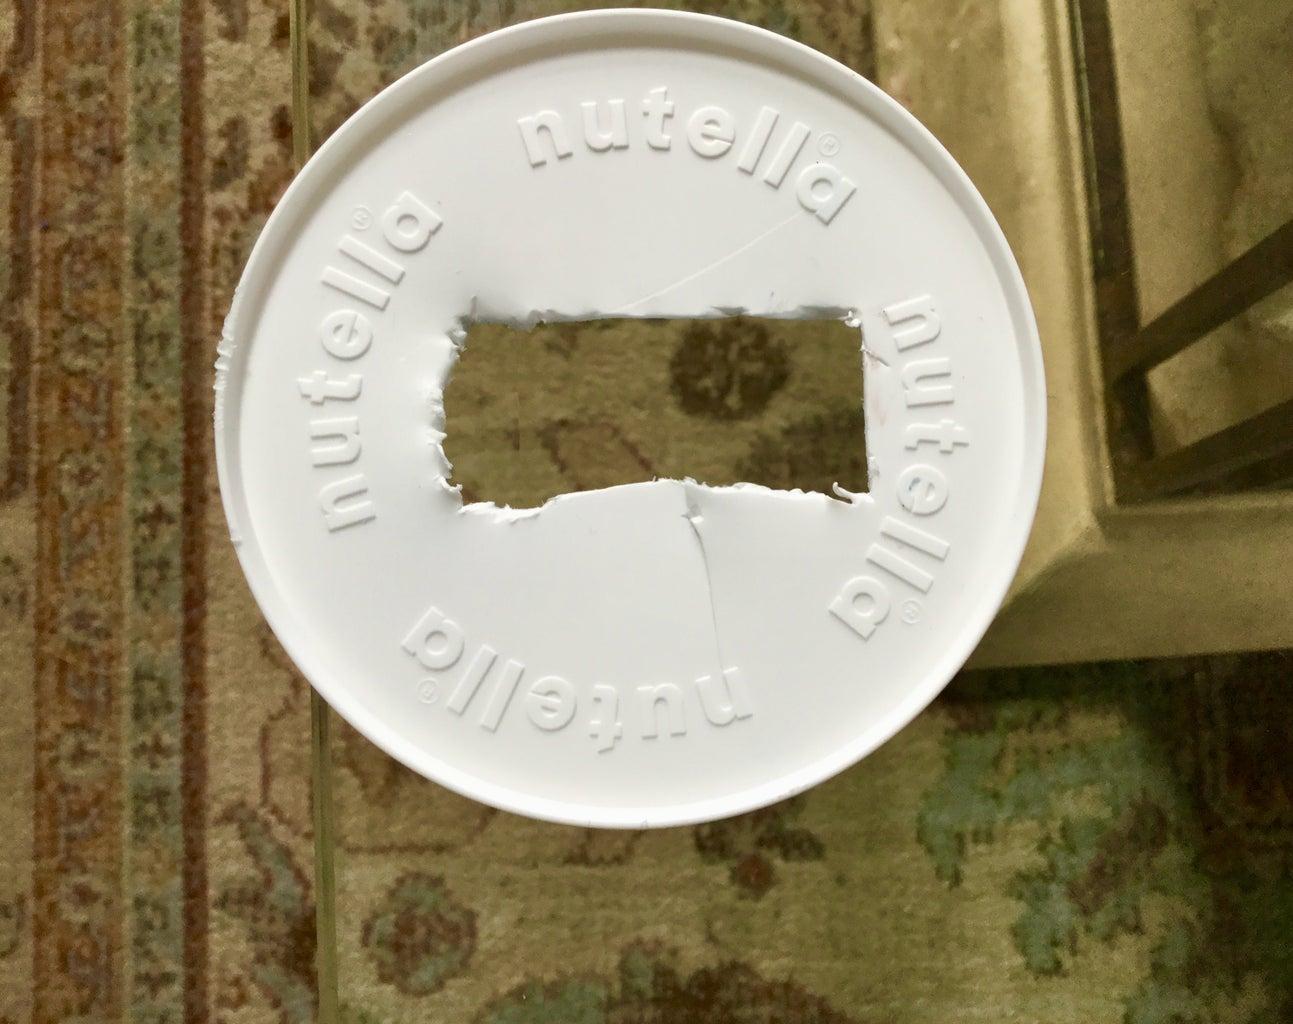 Cut the Cap of the Plastic Container